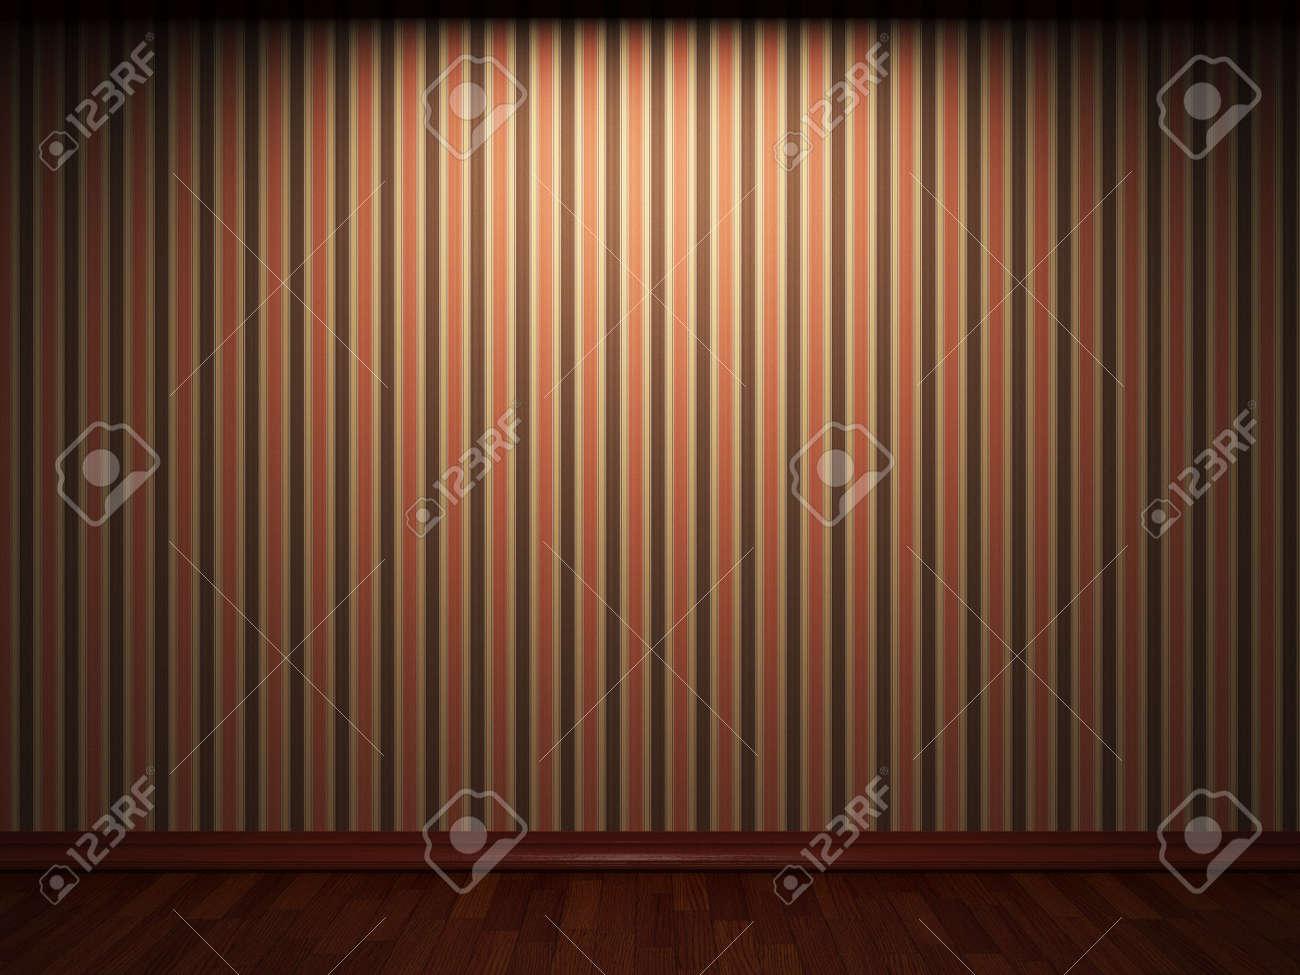 illuminated fabric wallpaper Stock Photo - 6832475